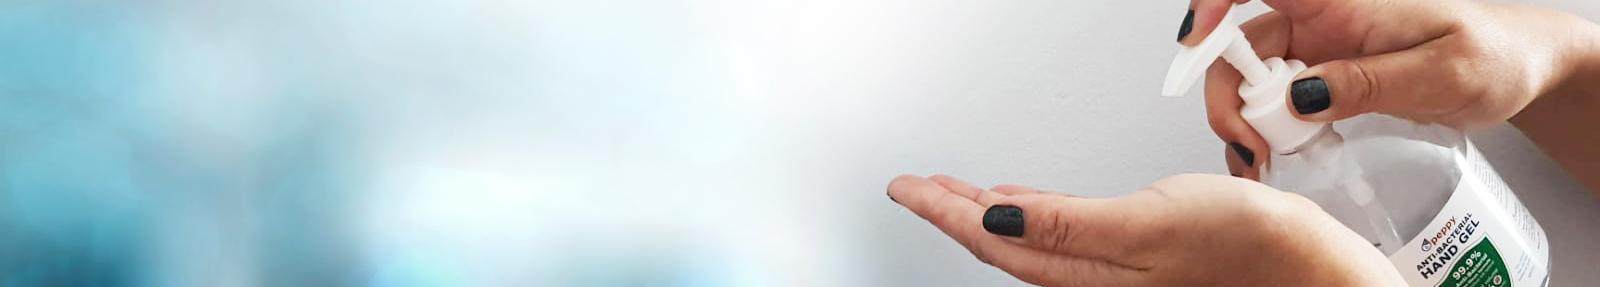 Hands using PeppyPure Hand Sanitiser